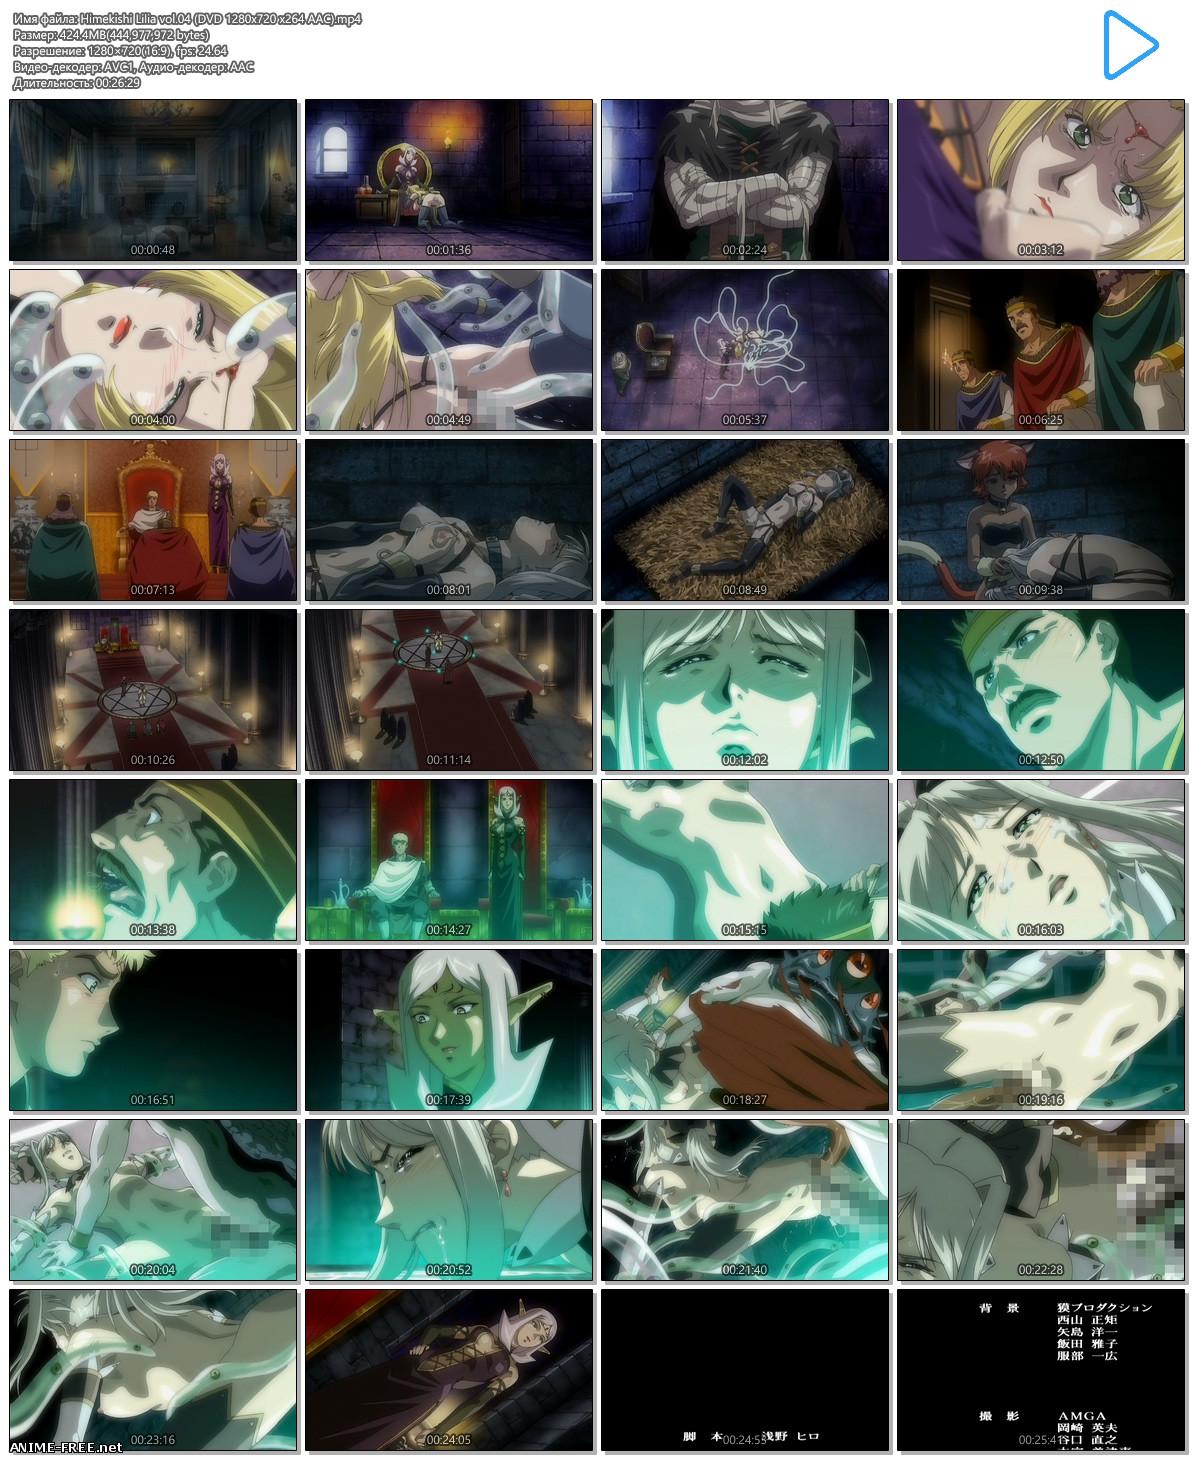 Принцесса-рыцарь Лилия / Himekishi Lilia / Princess Knight Lilia [Ep.1-6] [JAP,ENG,RUS] [720p] Anime Hentai